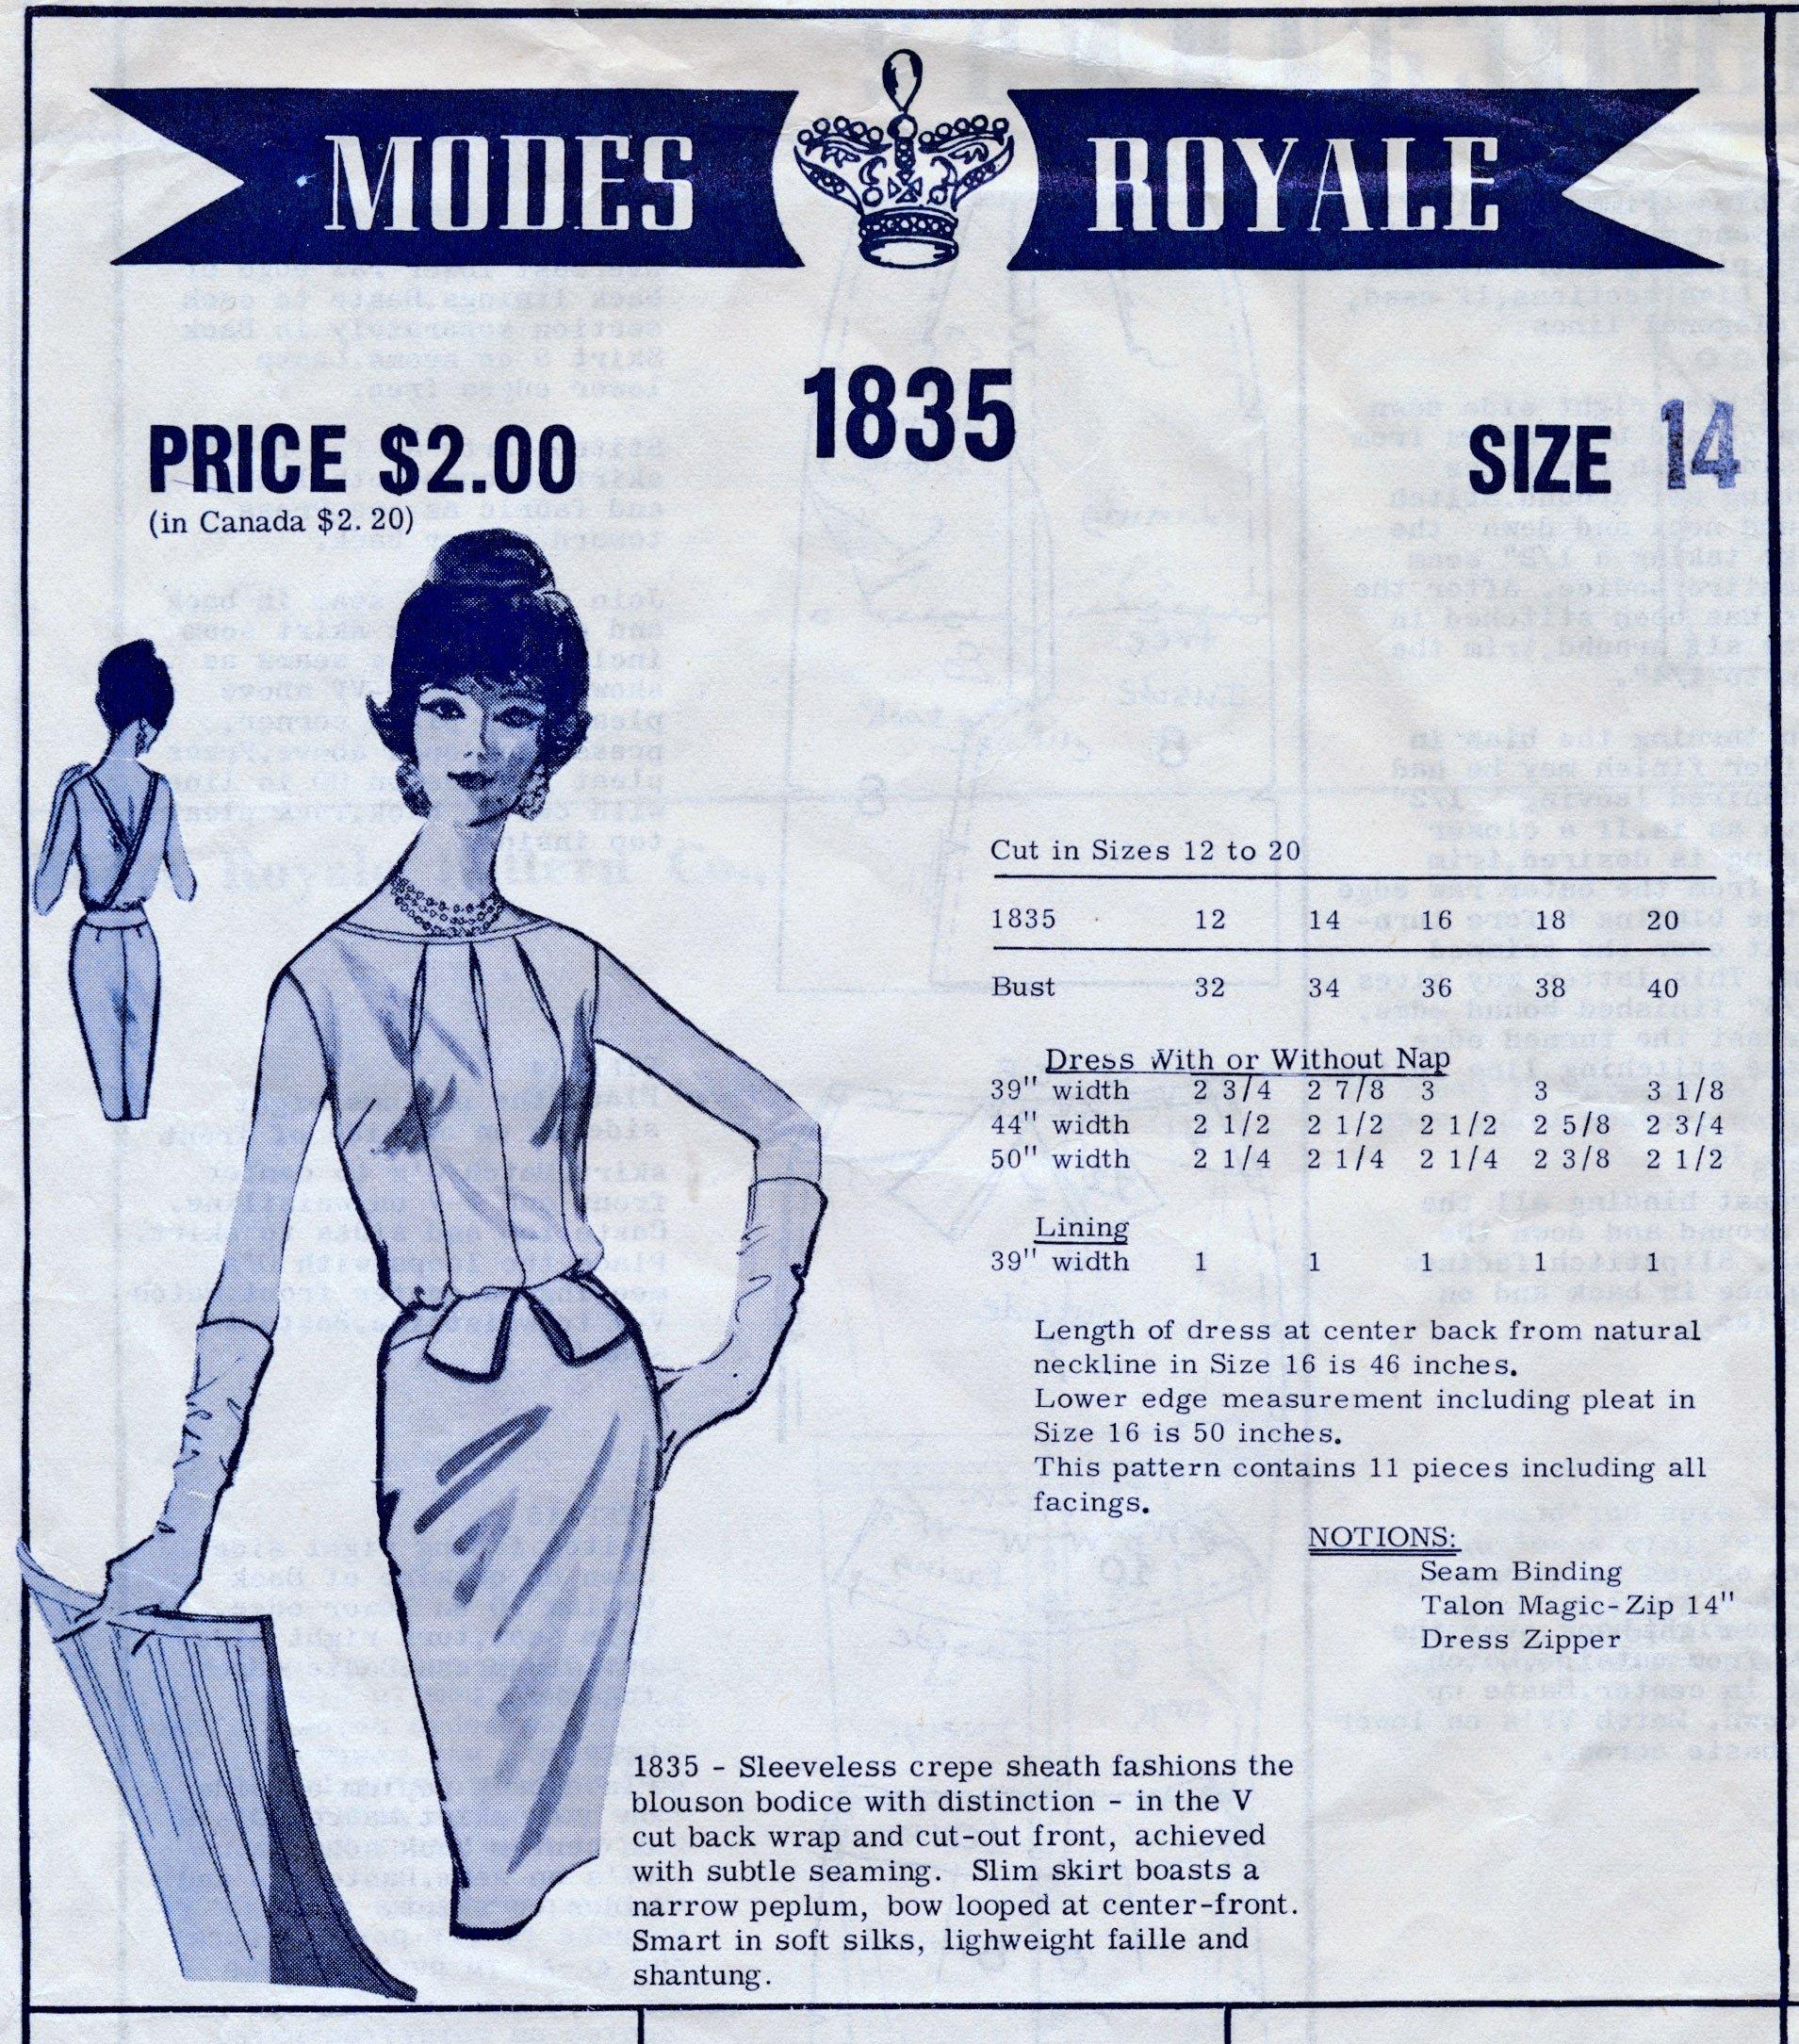 Modes Royale 1835